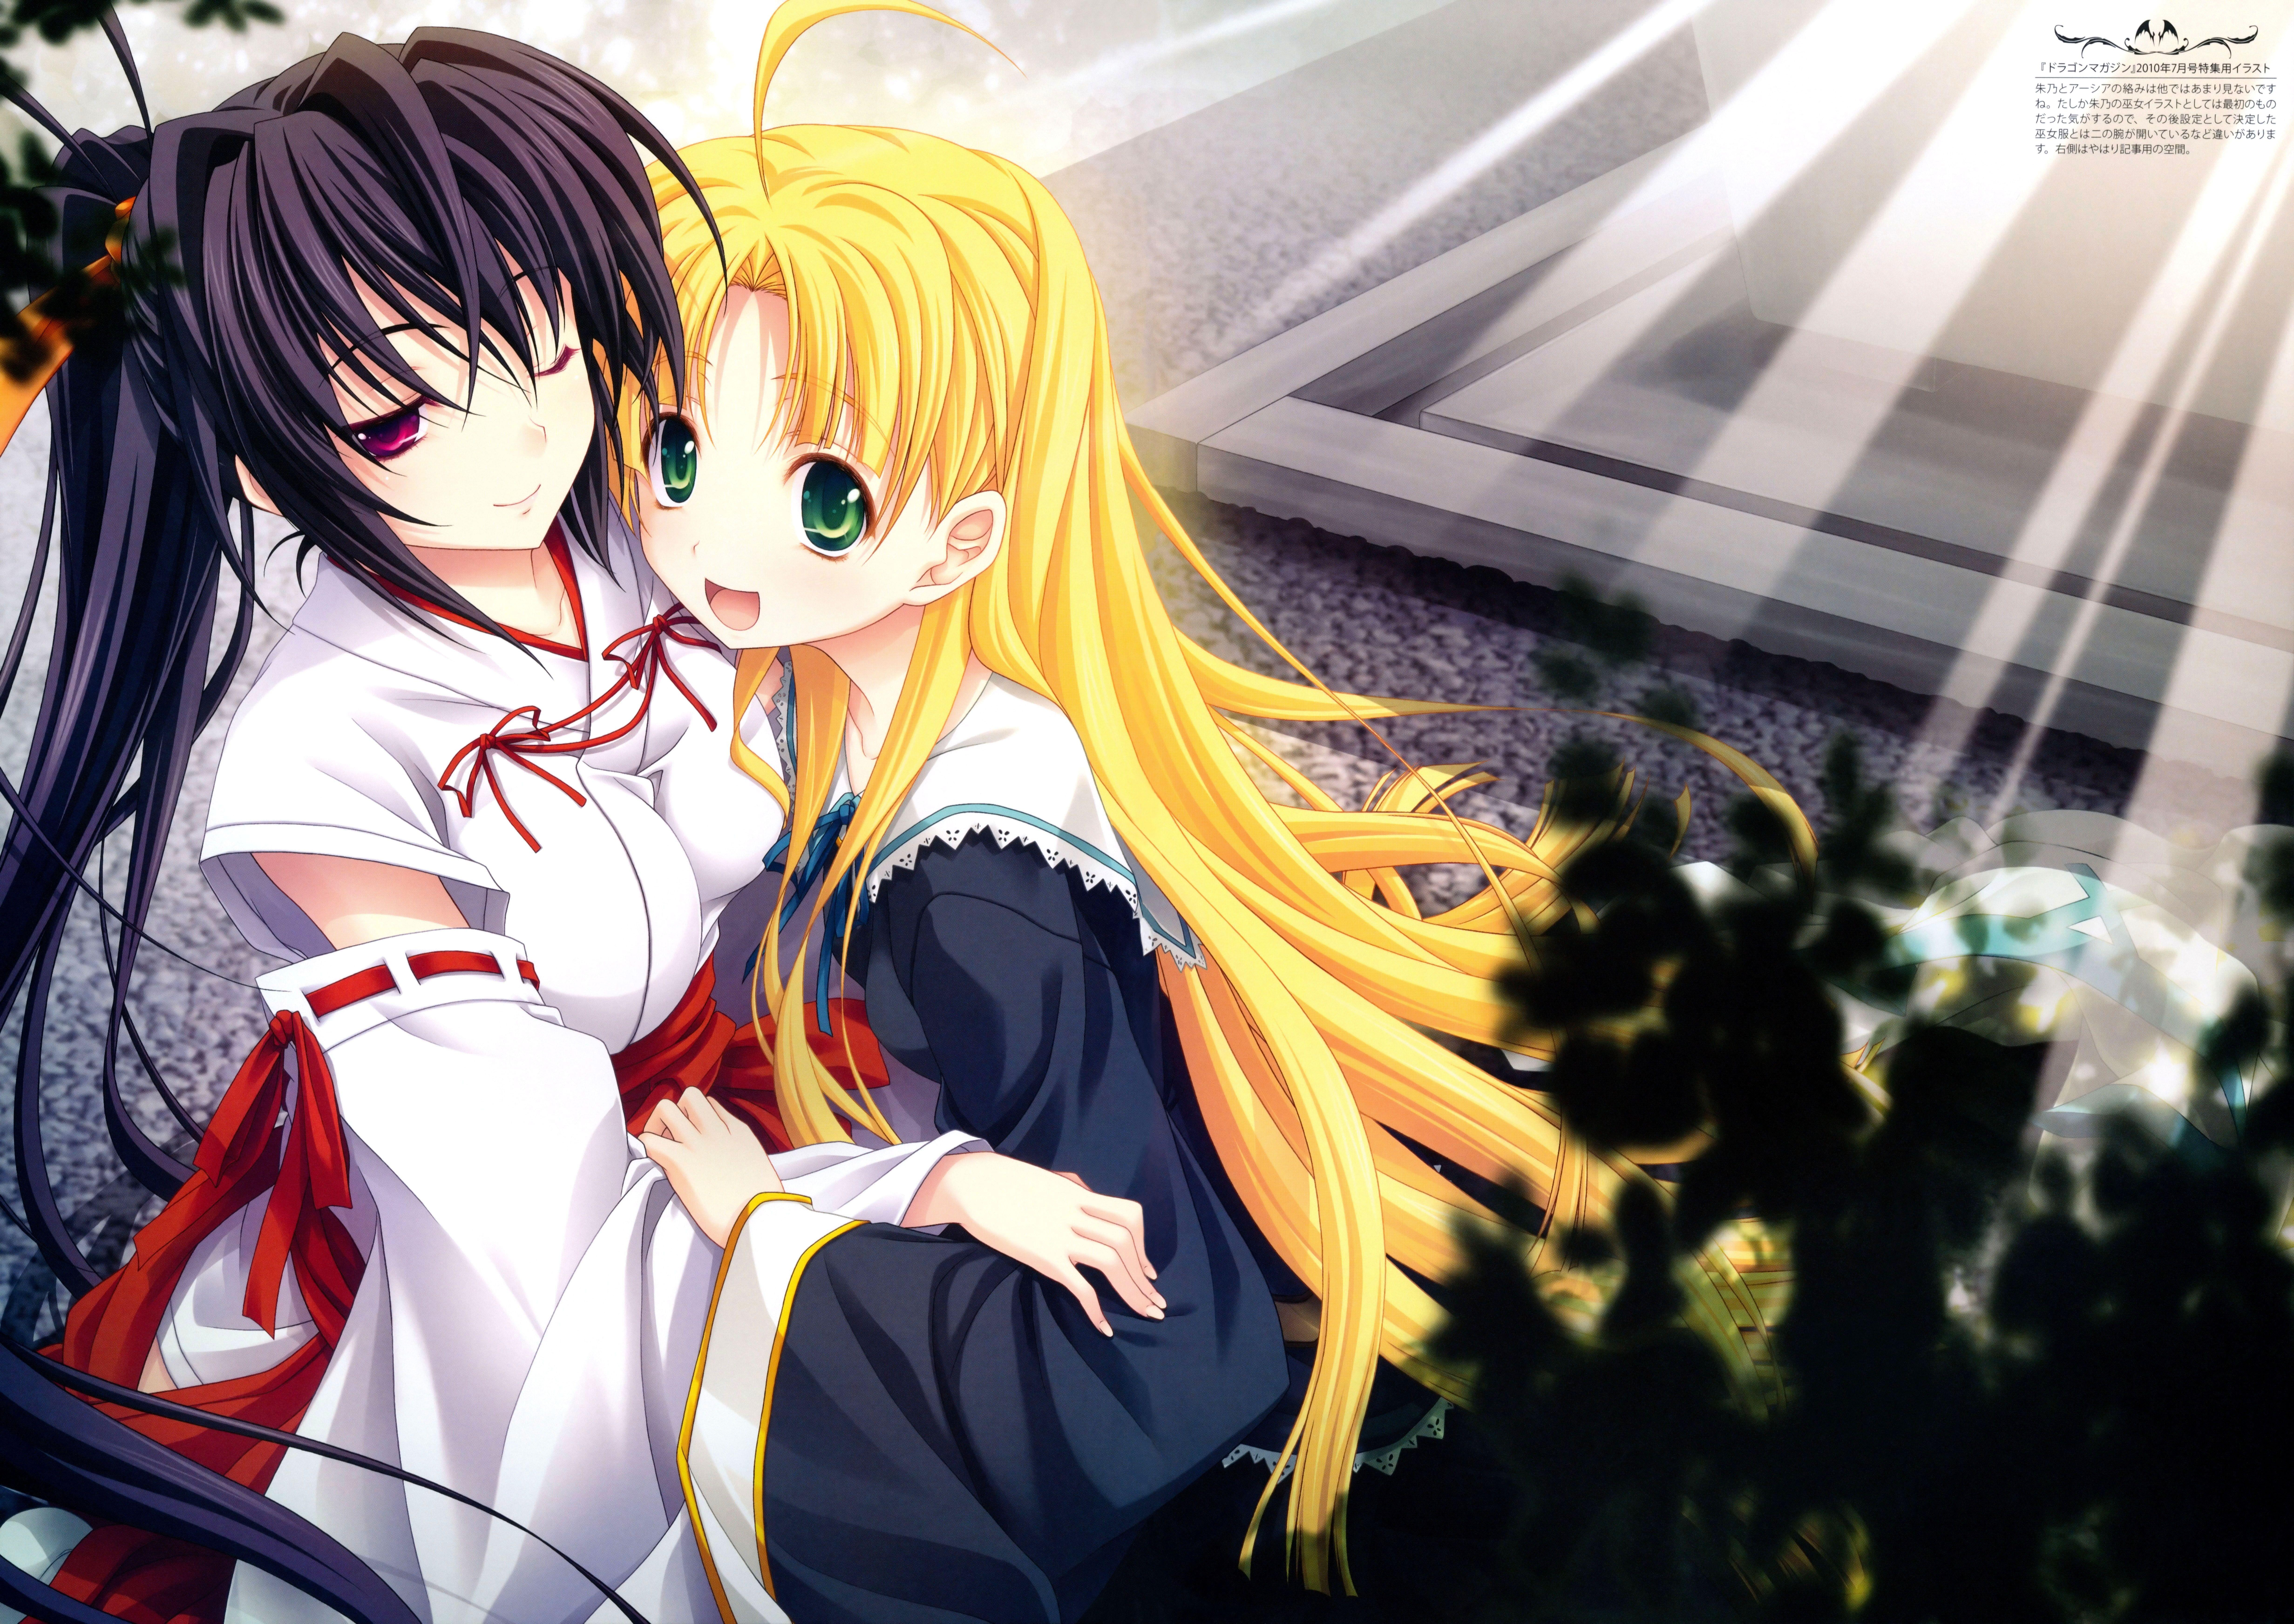 Anime High School Dxd Akeno Himejima Hd Wallpaper Akeno Anime Dxd High Himejima School Wallpaper Anime High School Dxd Highschool Dxd